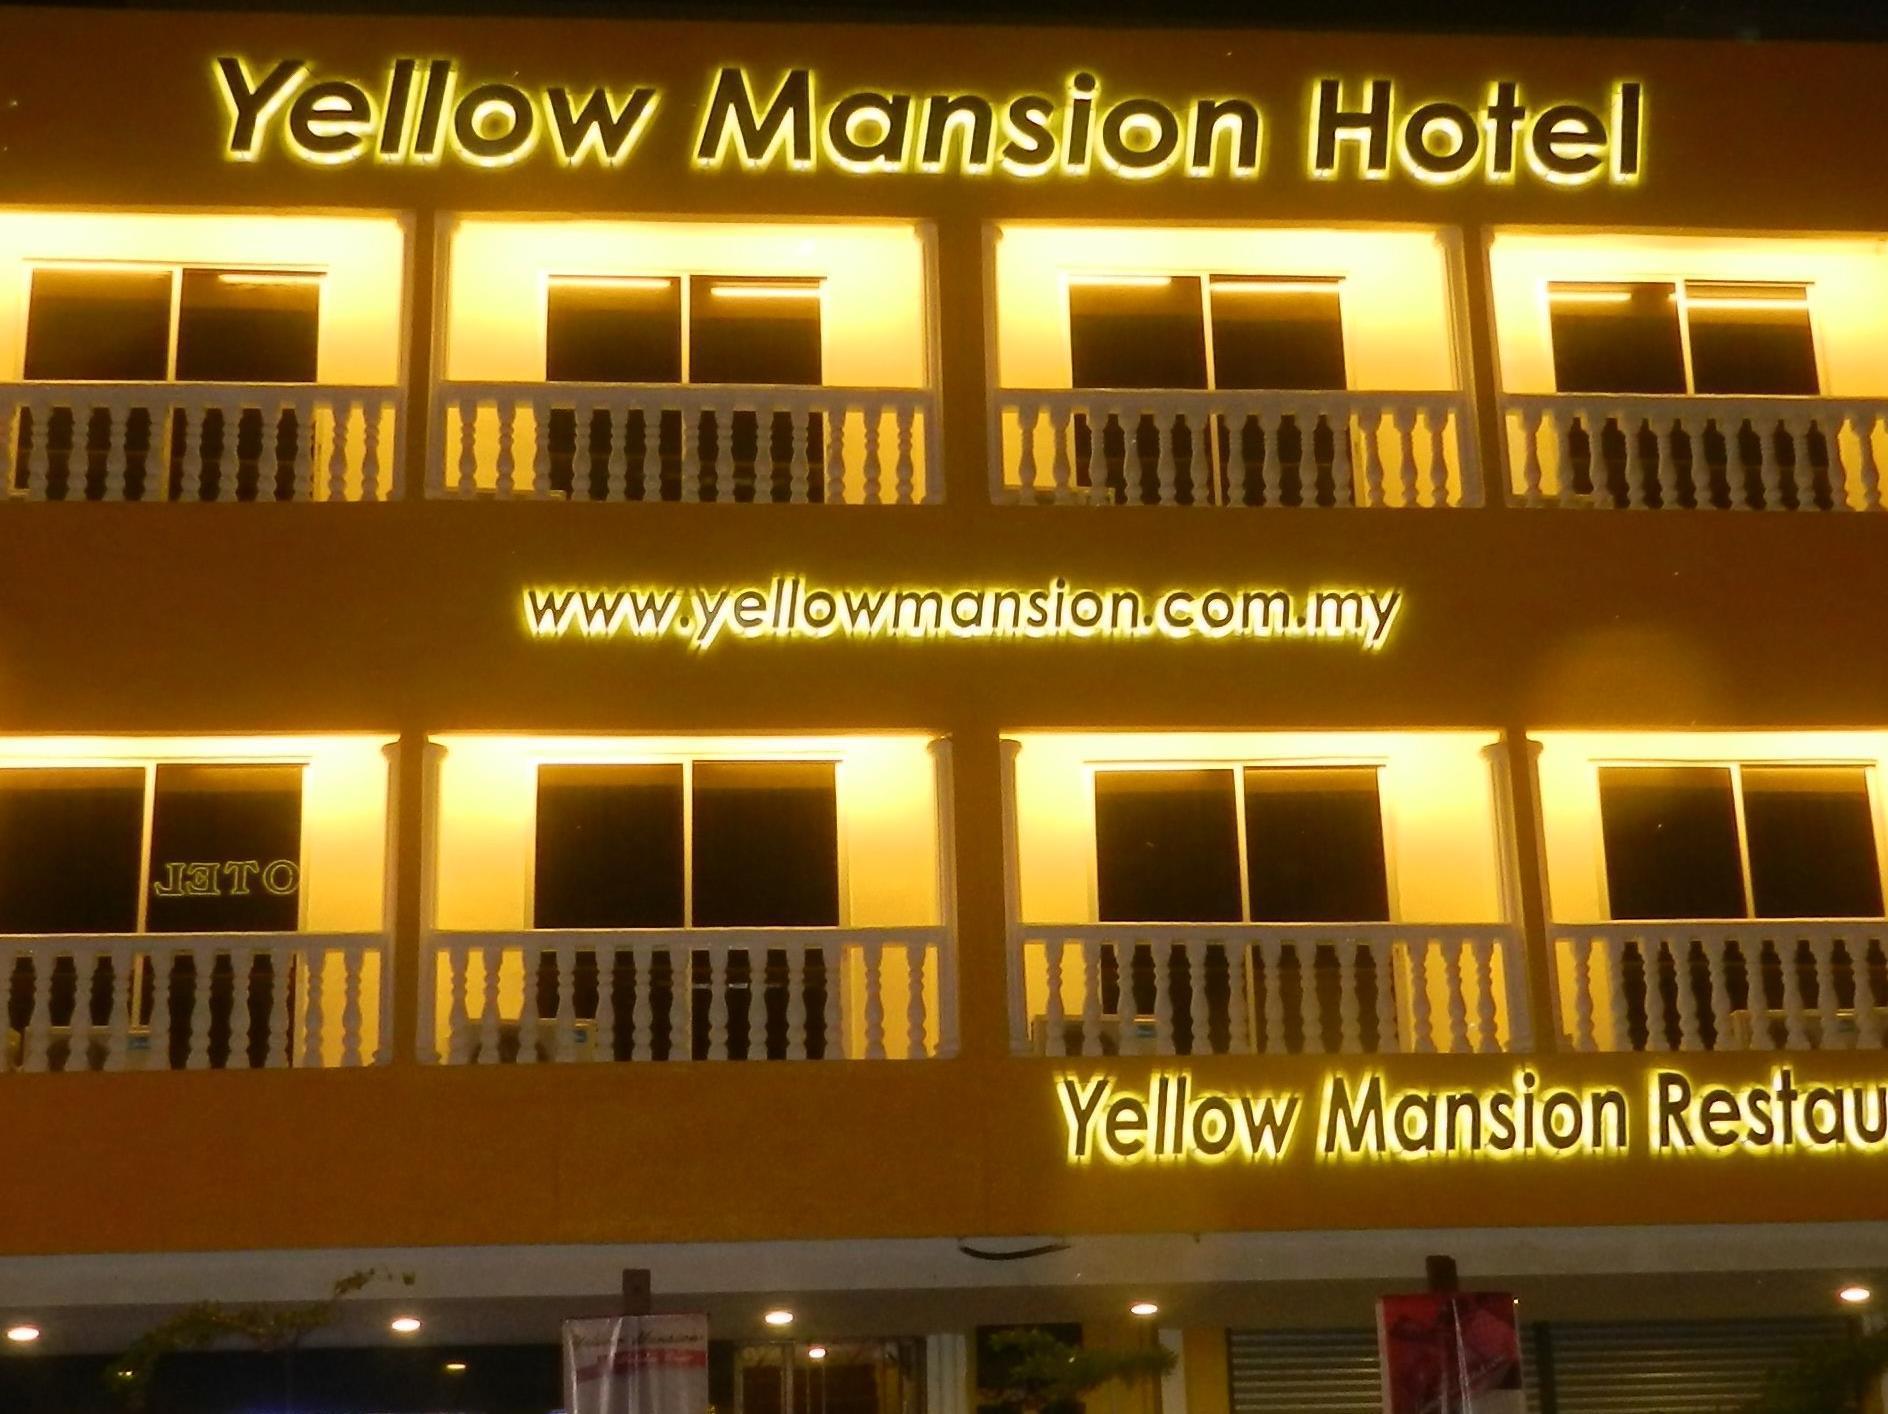 Yellow Mansion Hotel Melaka Raya, Kota Melaka